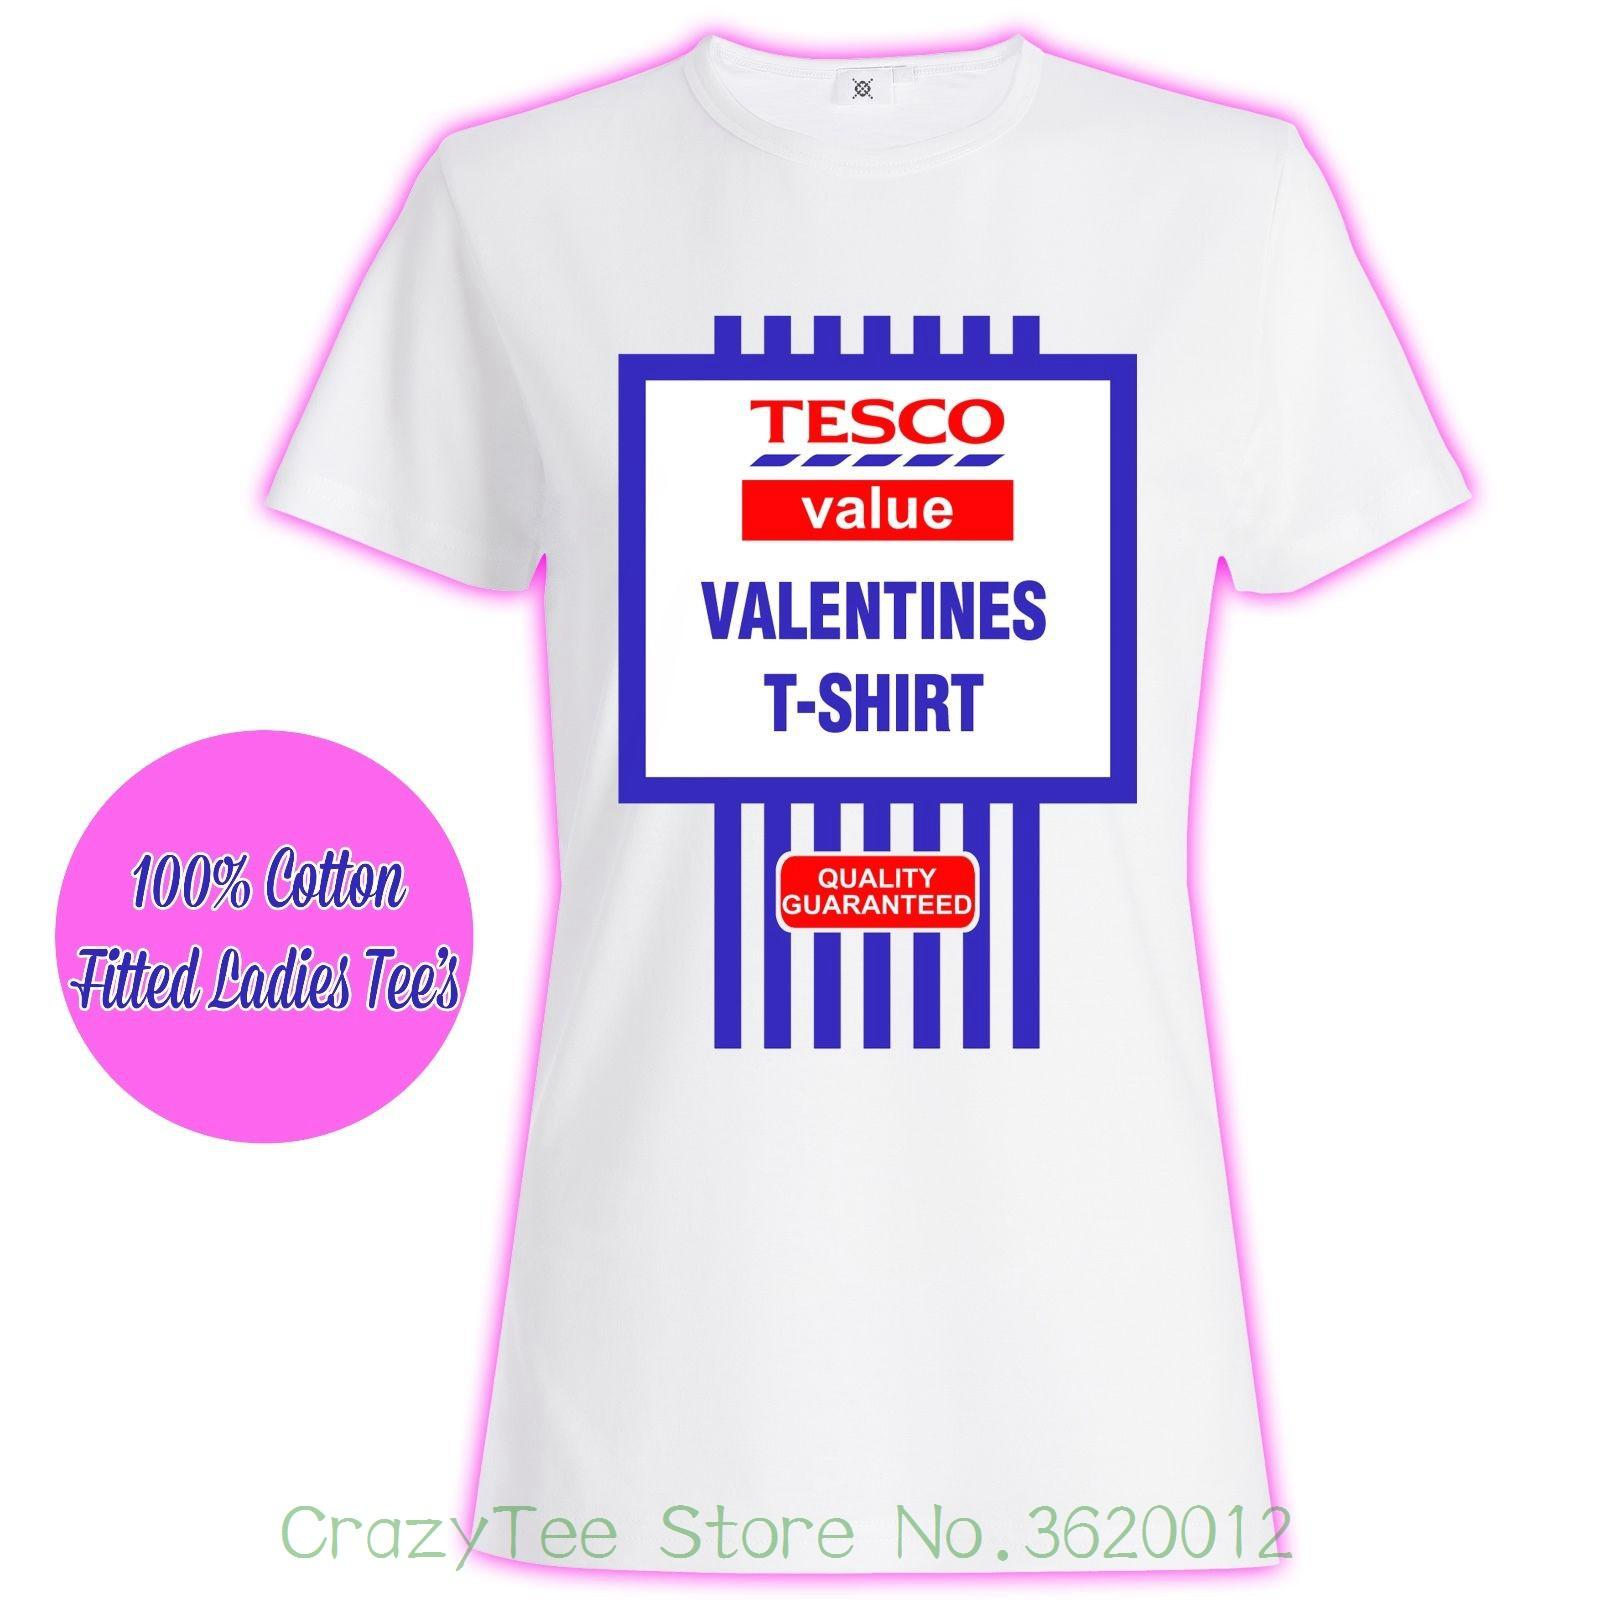 6e5efdb624791 Women's Tee Womans Ladies Girls Valentines Princess Love Slogan Value  Glitter T Shirt Top Tees 2018 Summer Style